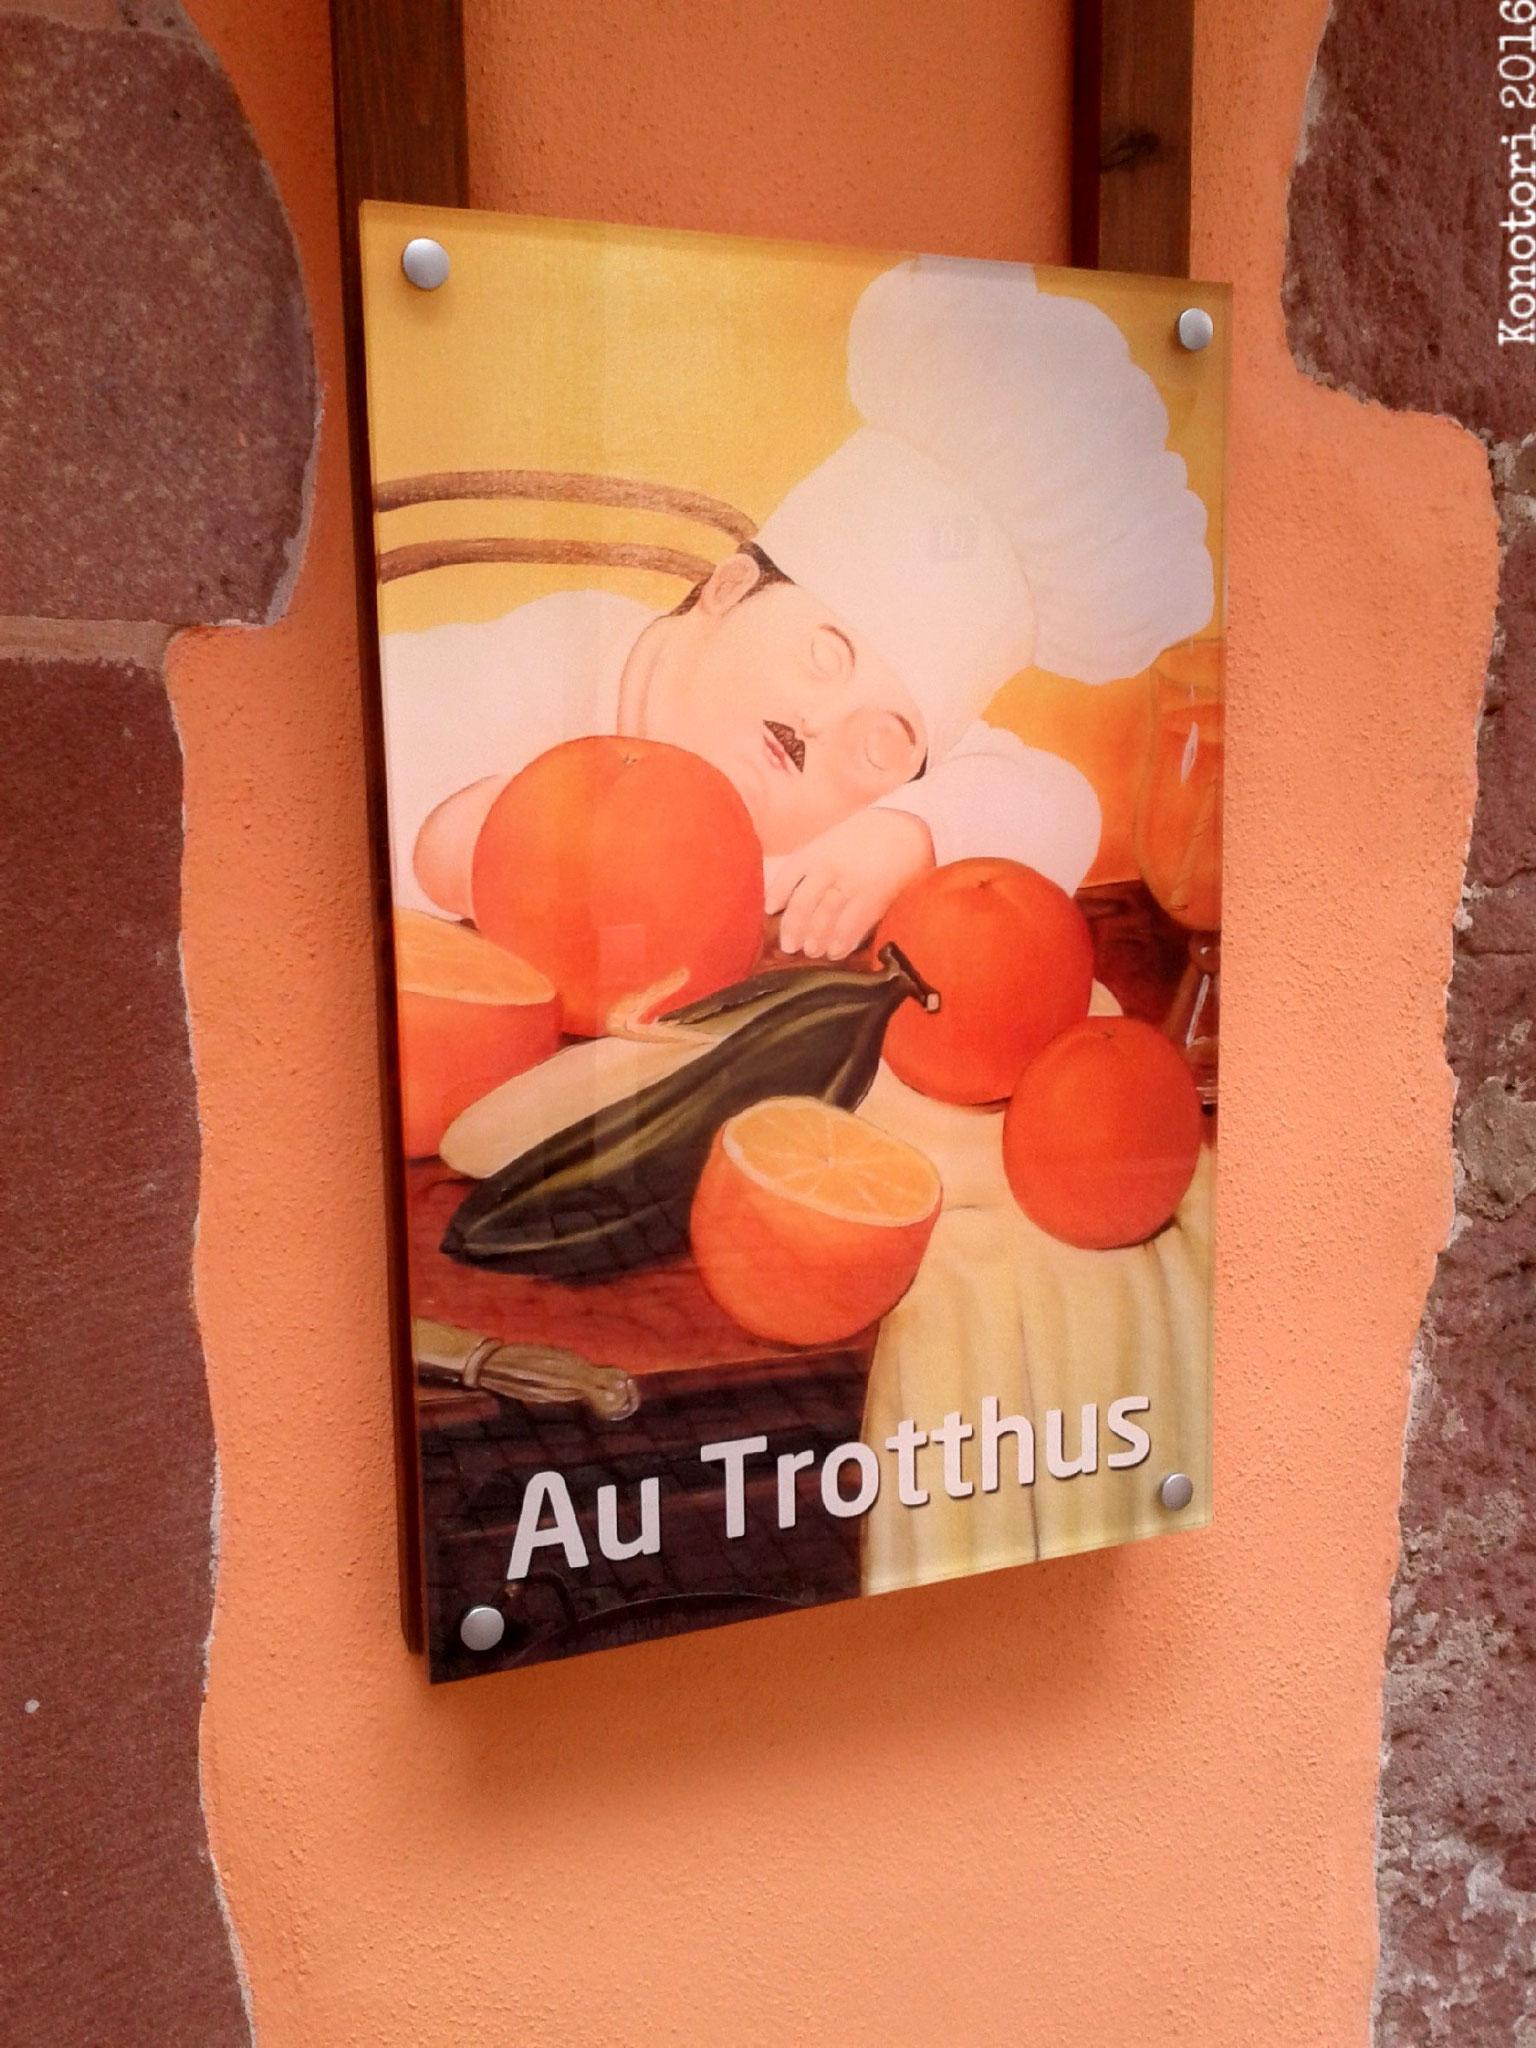 Trotthus